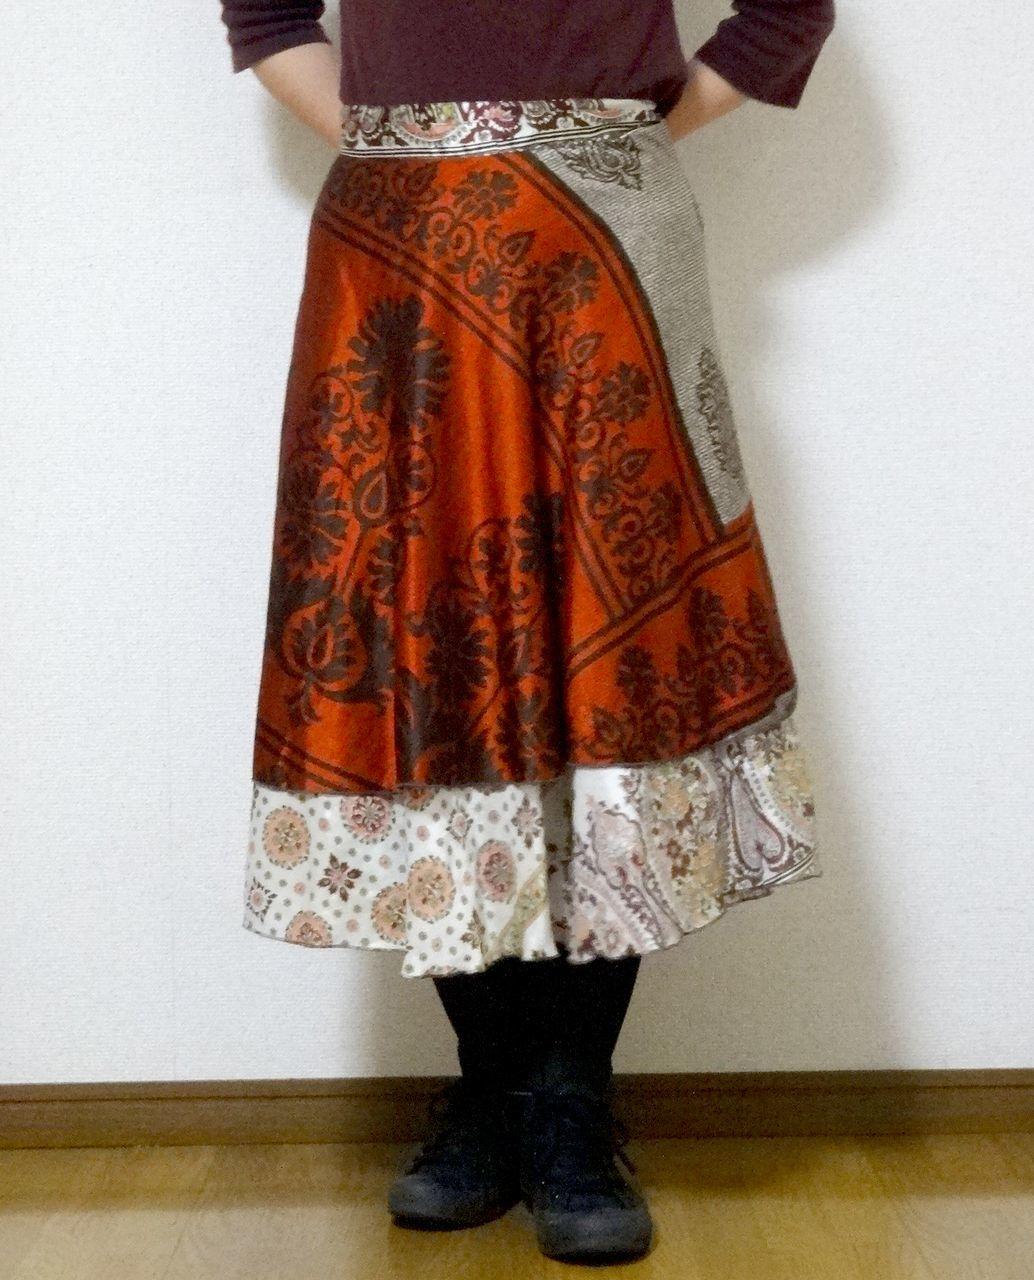 dss-027 シルクサリー巻きスカートショート